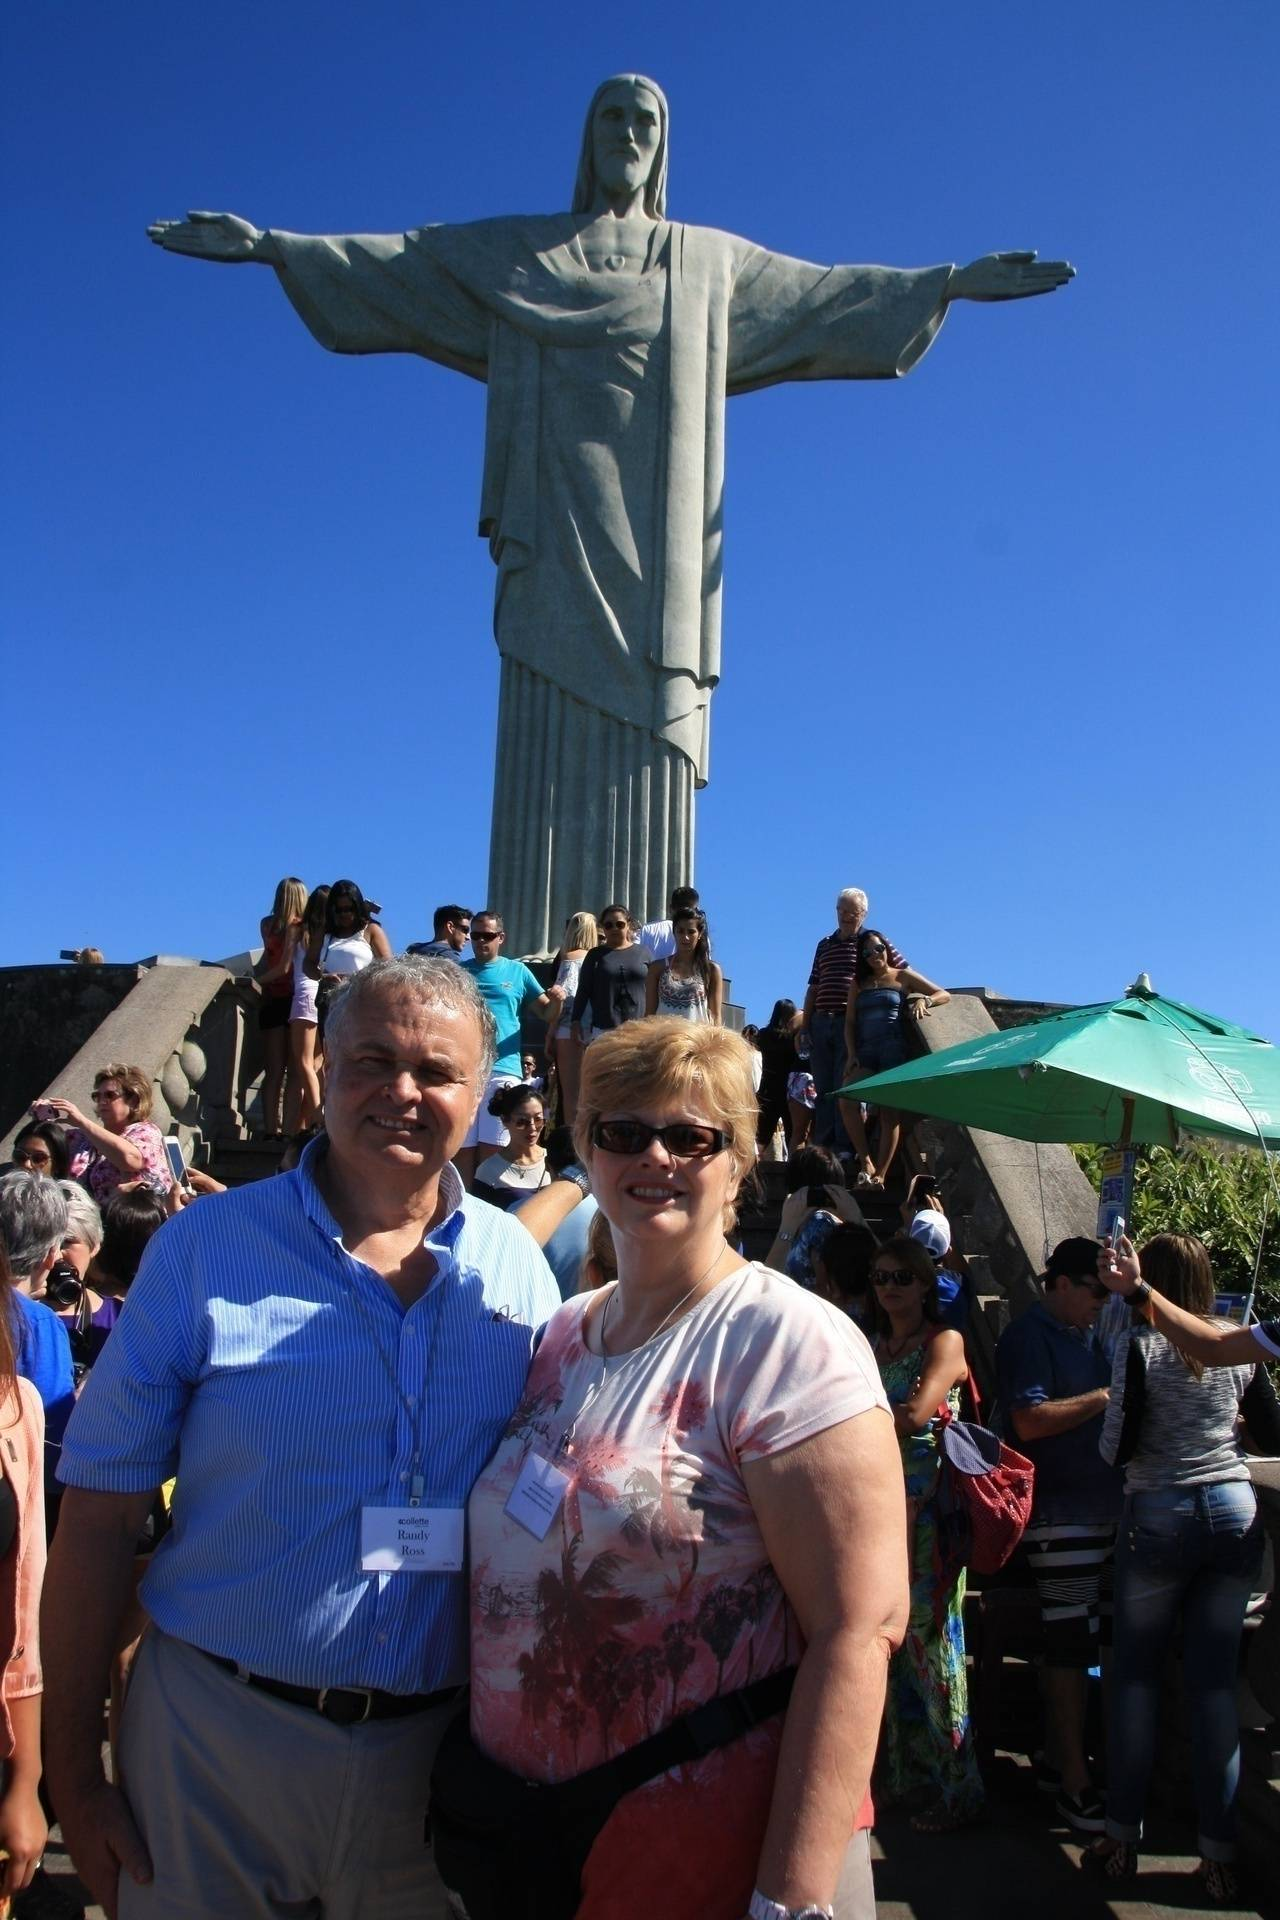 Lynda and Randy at Christ The Redeemer - Corcovado, Rio